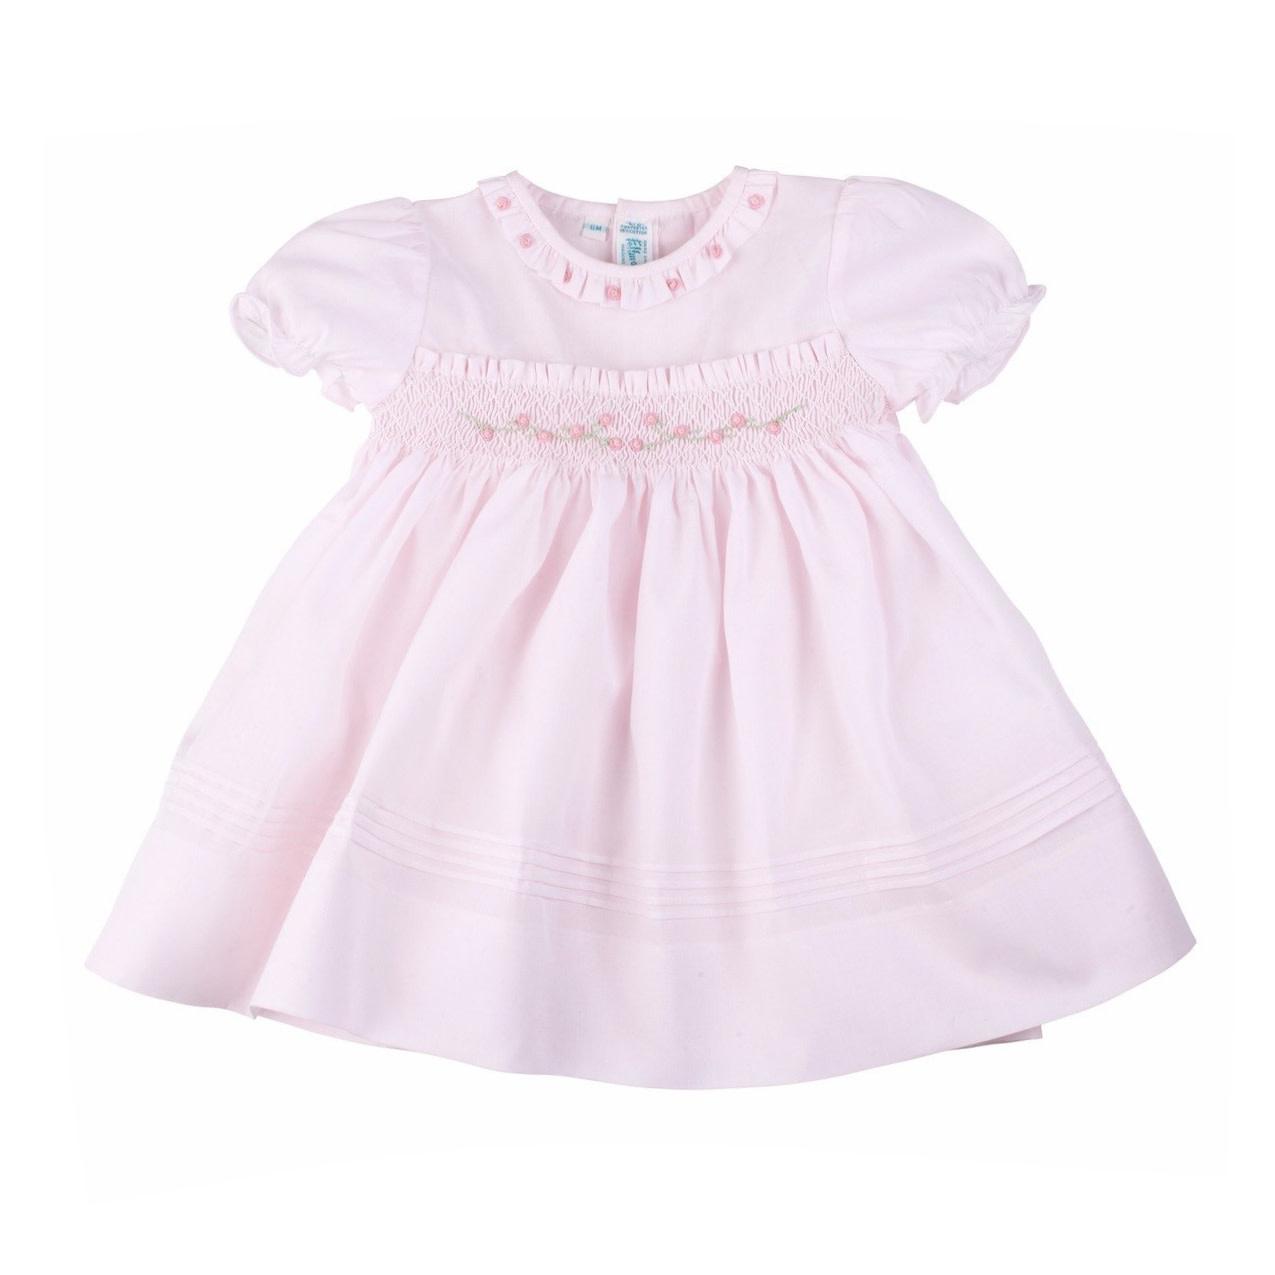 Feltman Brothers Pink Rose Garden Collection Dress